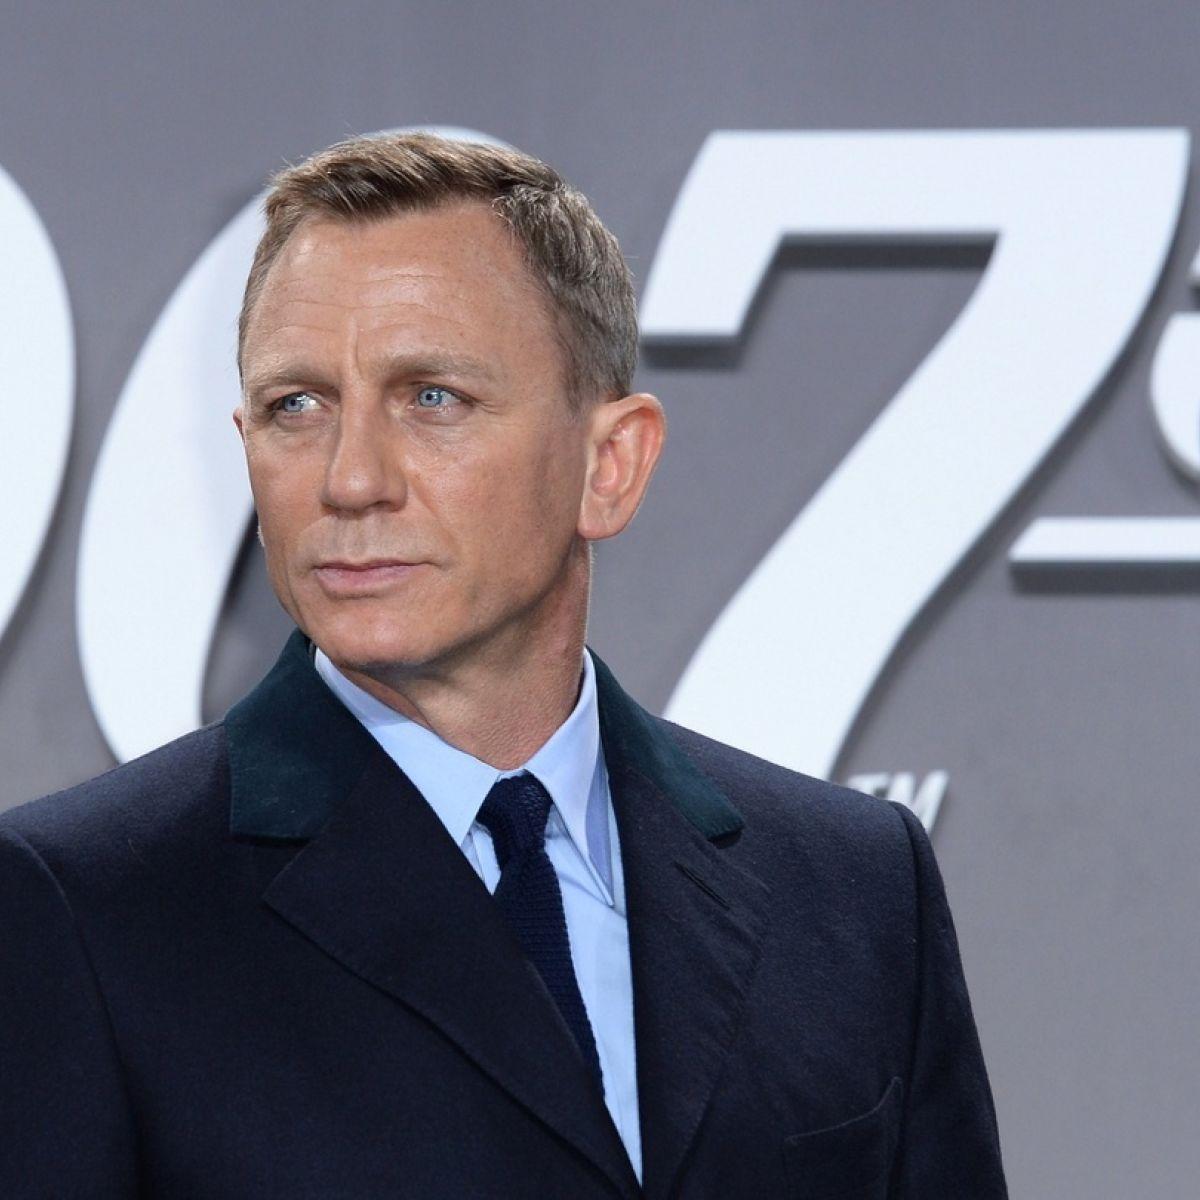 James Bond needs Daniel Craig, hence the €132m fee